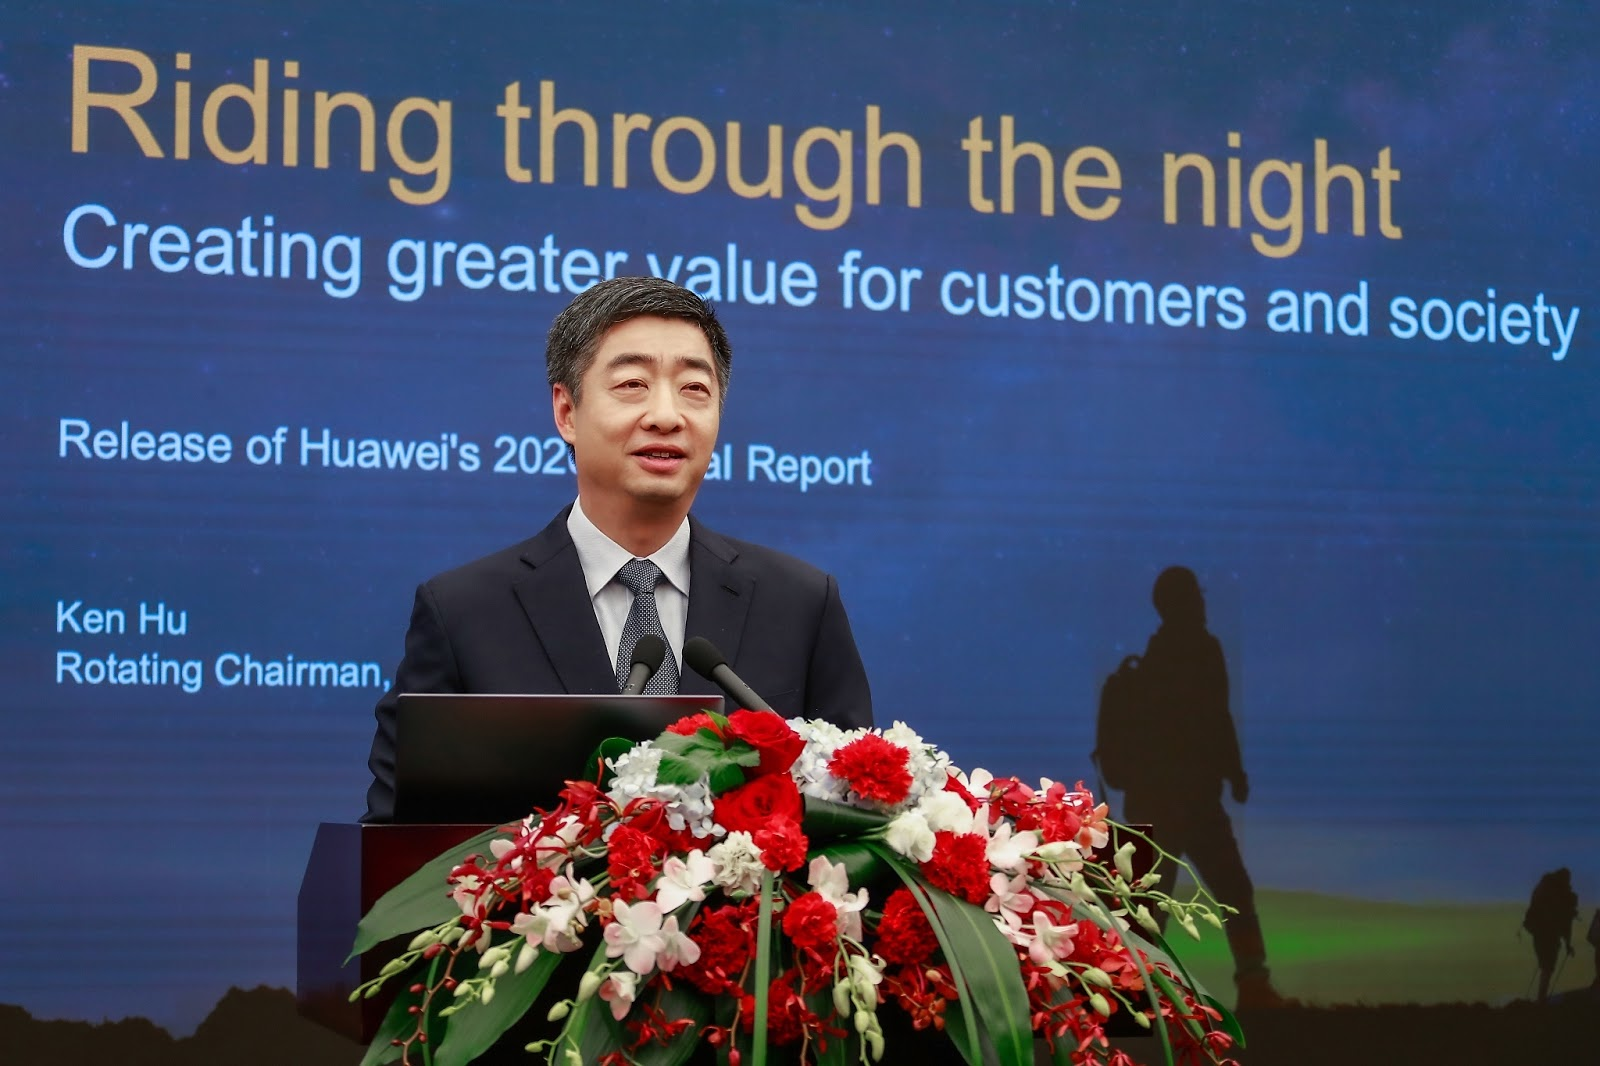 Huawei เผยรายงานประจำปี 2563 พร้อมยึดมั่นเดินหน้าสร้างมูลค่าเพิ่มเพื่อลูกค้าและภาคสังคม แม้ต้องเผชิญกับความท้าทาย